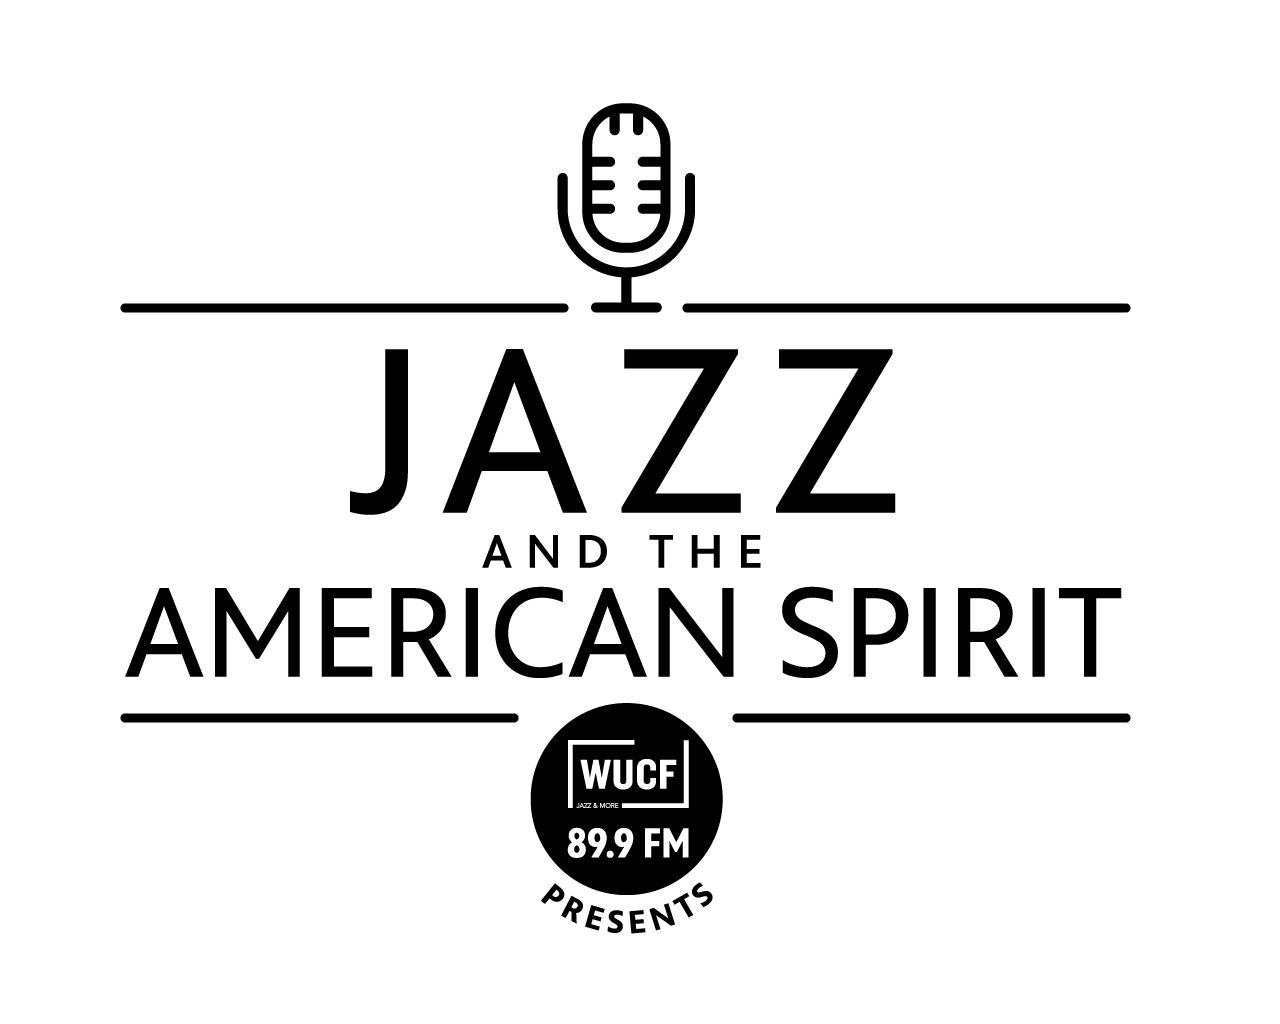 Jazz-am-spirit-logo_small